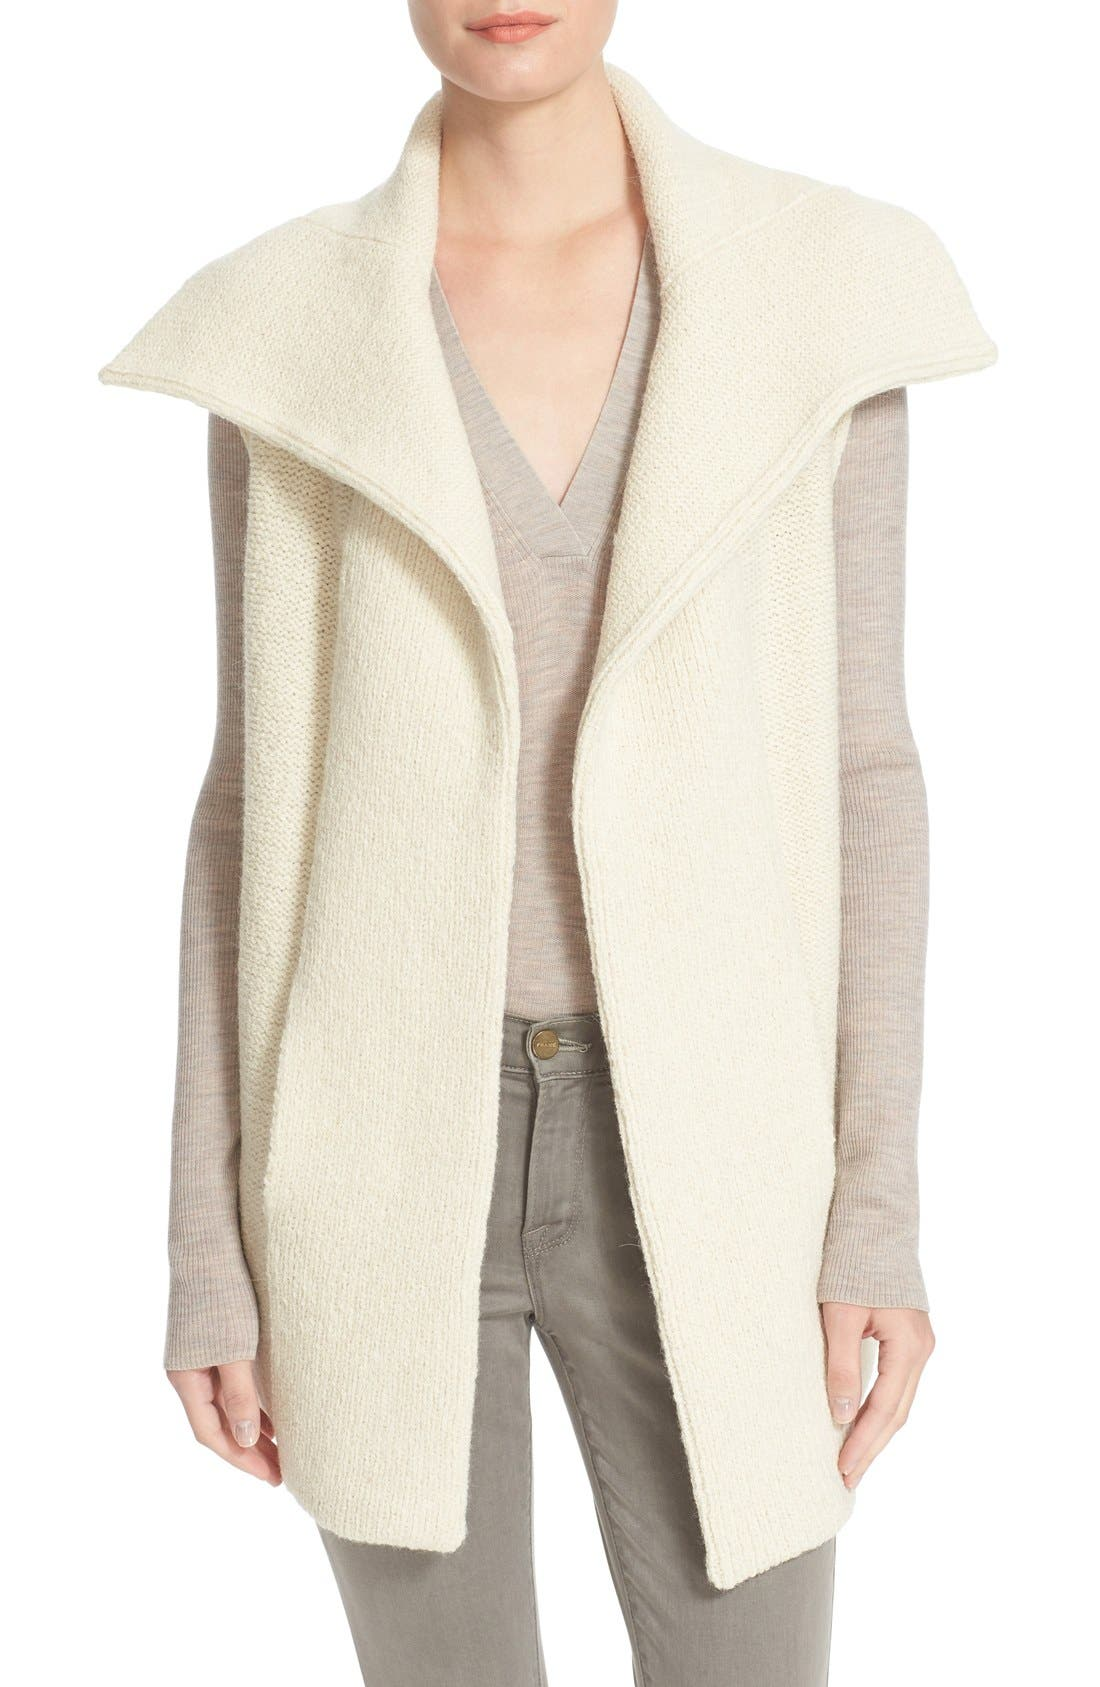 Alternate Image 1 Selected - BrochuWalker 'Oak' Alpaca Blend SweaterVest